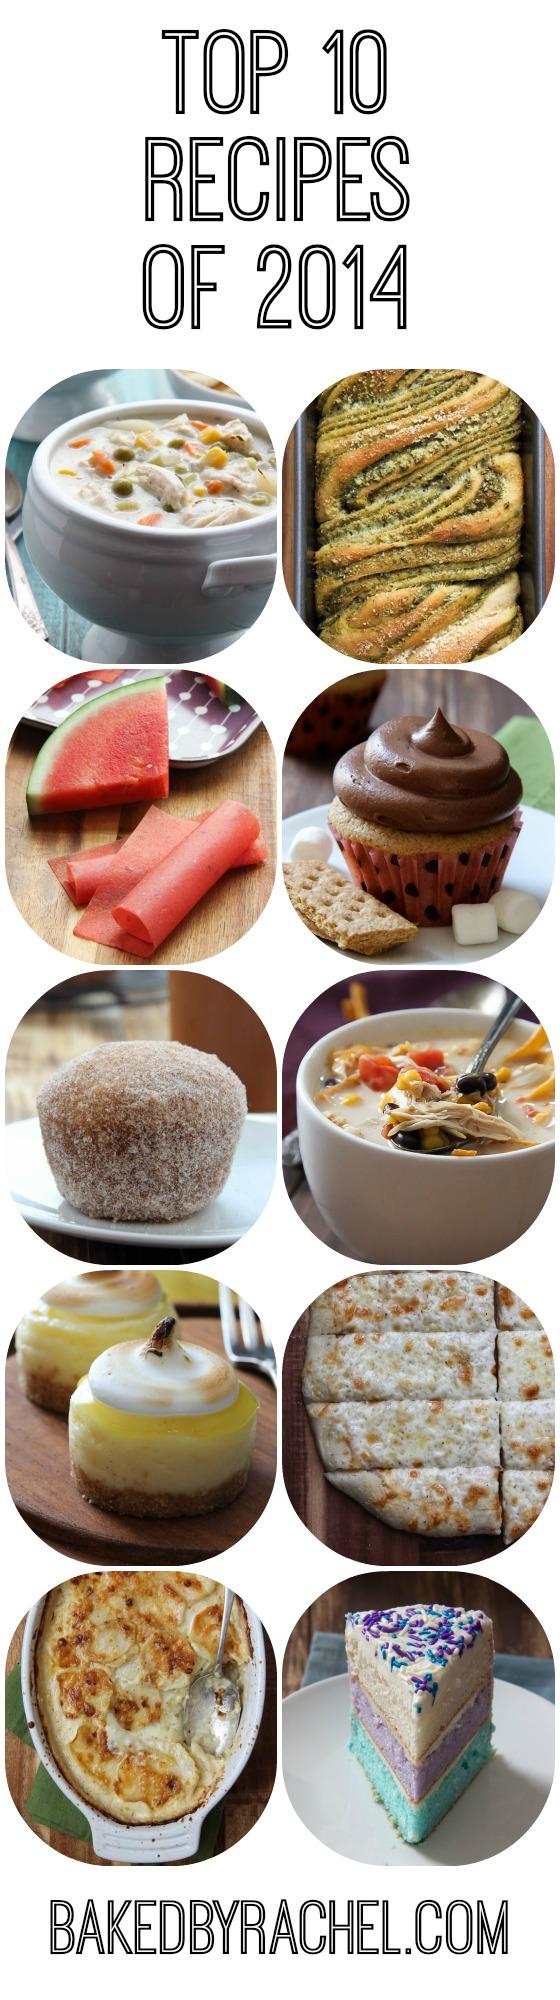 The top 10 reader favorite recipes of 2014 from bakedbyrachel.com